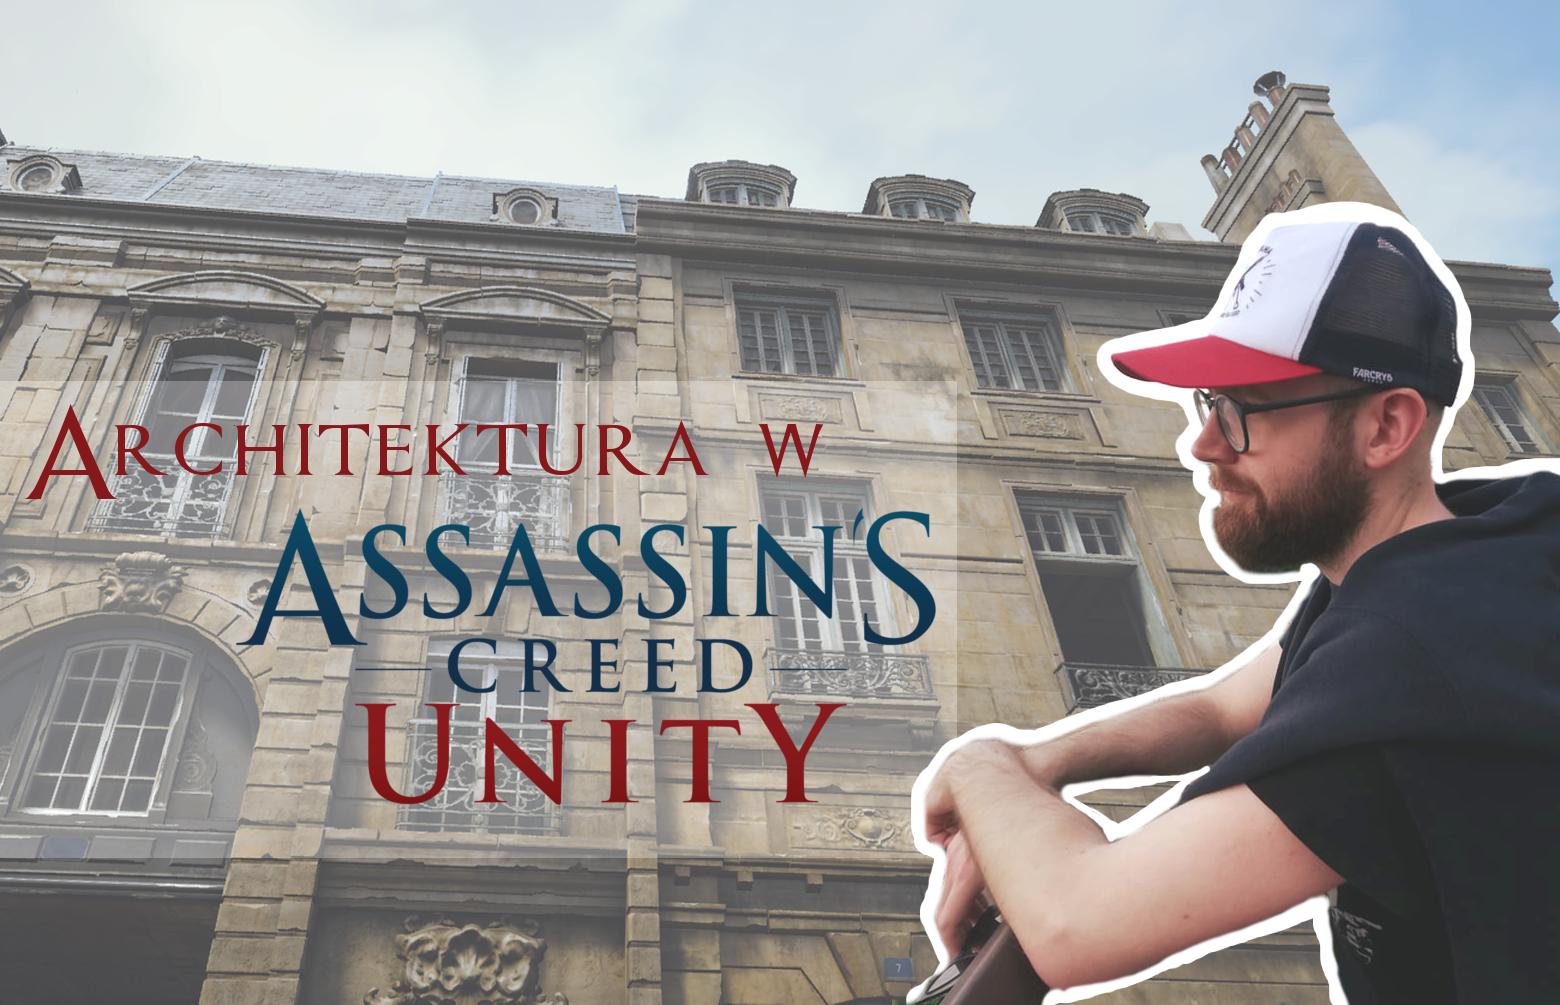 Architektura w Assassin's Creed: Unity – francuski barok Paryża